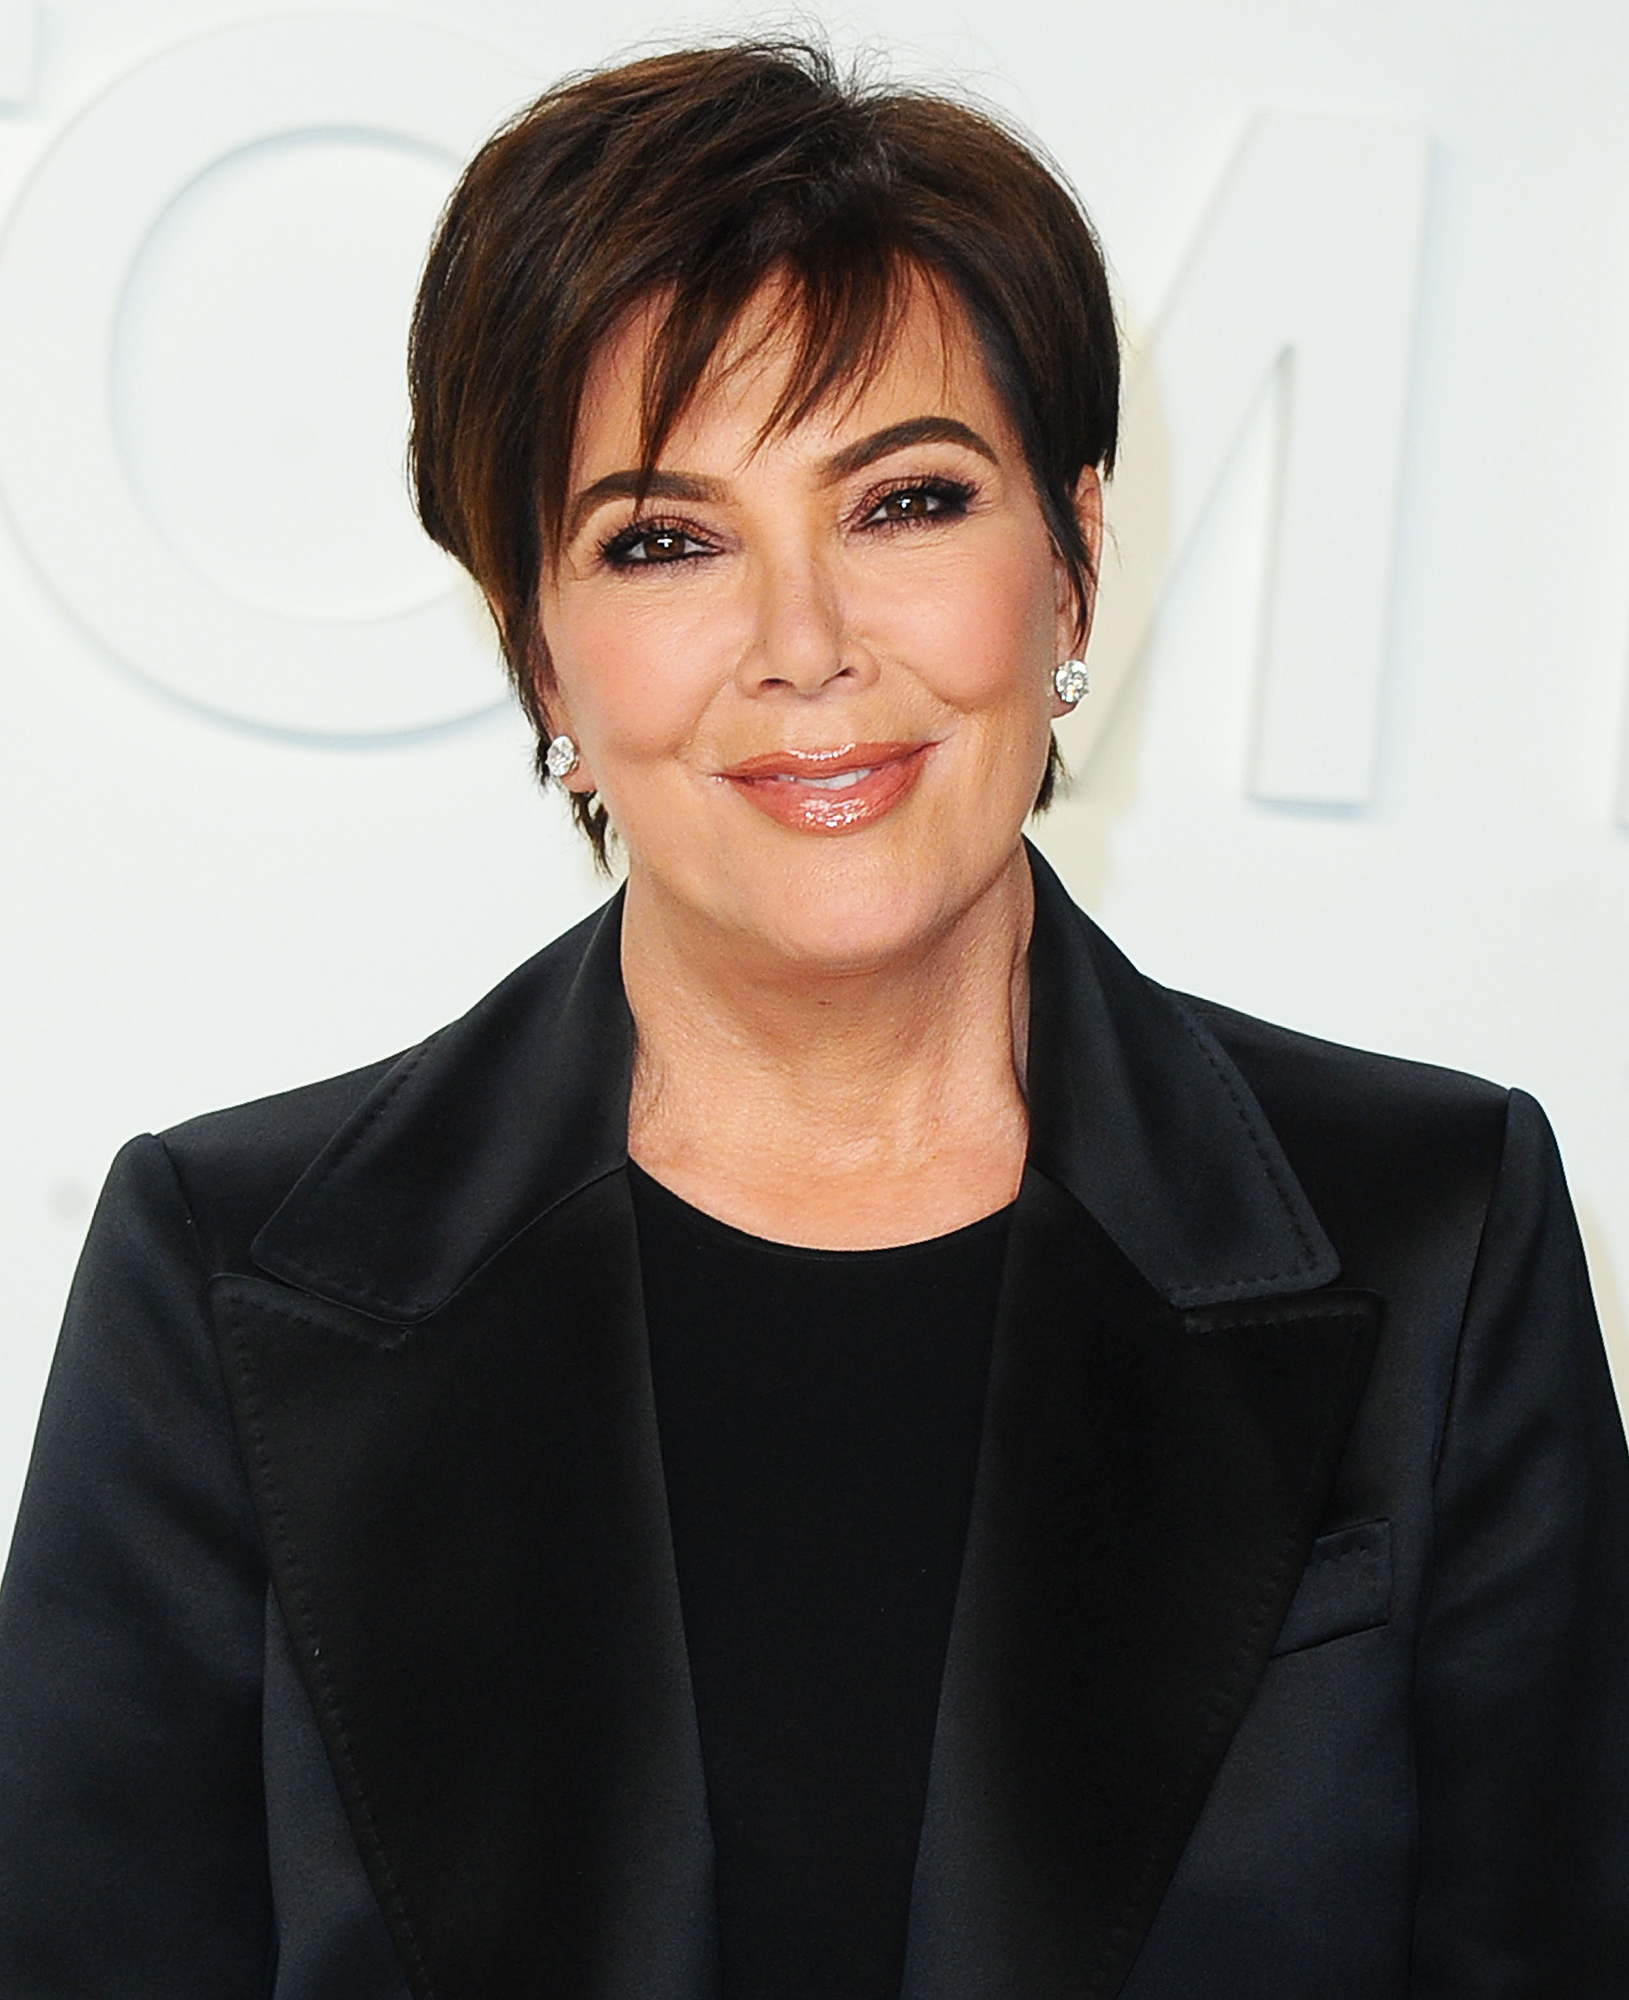 Kris Jenner Plays Coy About Khloe Kardashian and Tristan Thompson's Status 2